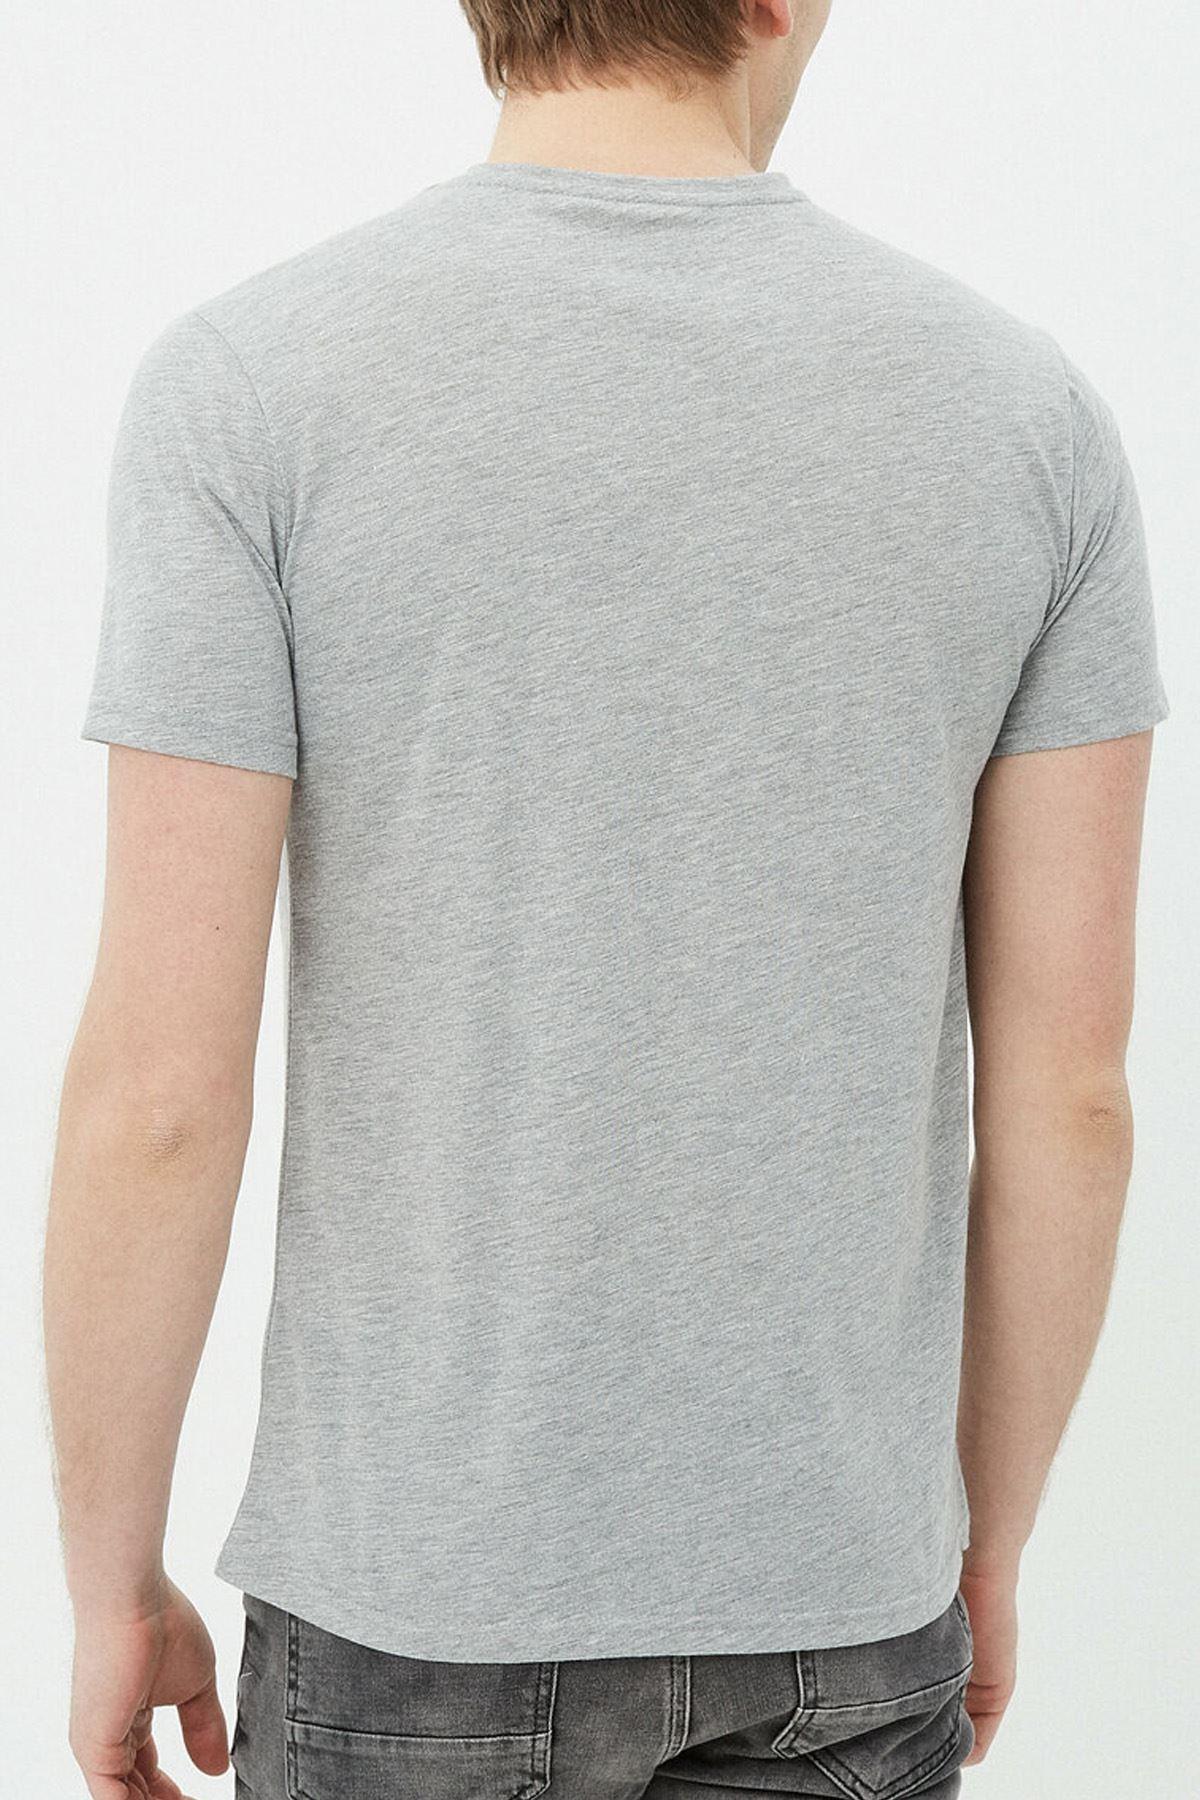 Anime Bang Gri Erkek Tshirt - Tişört